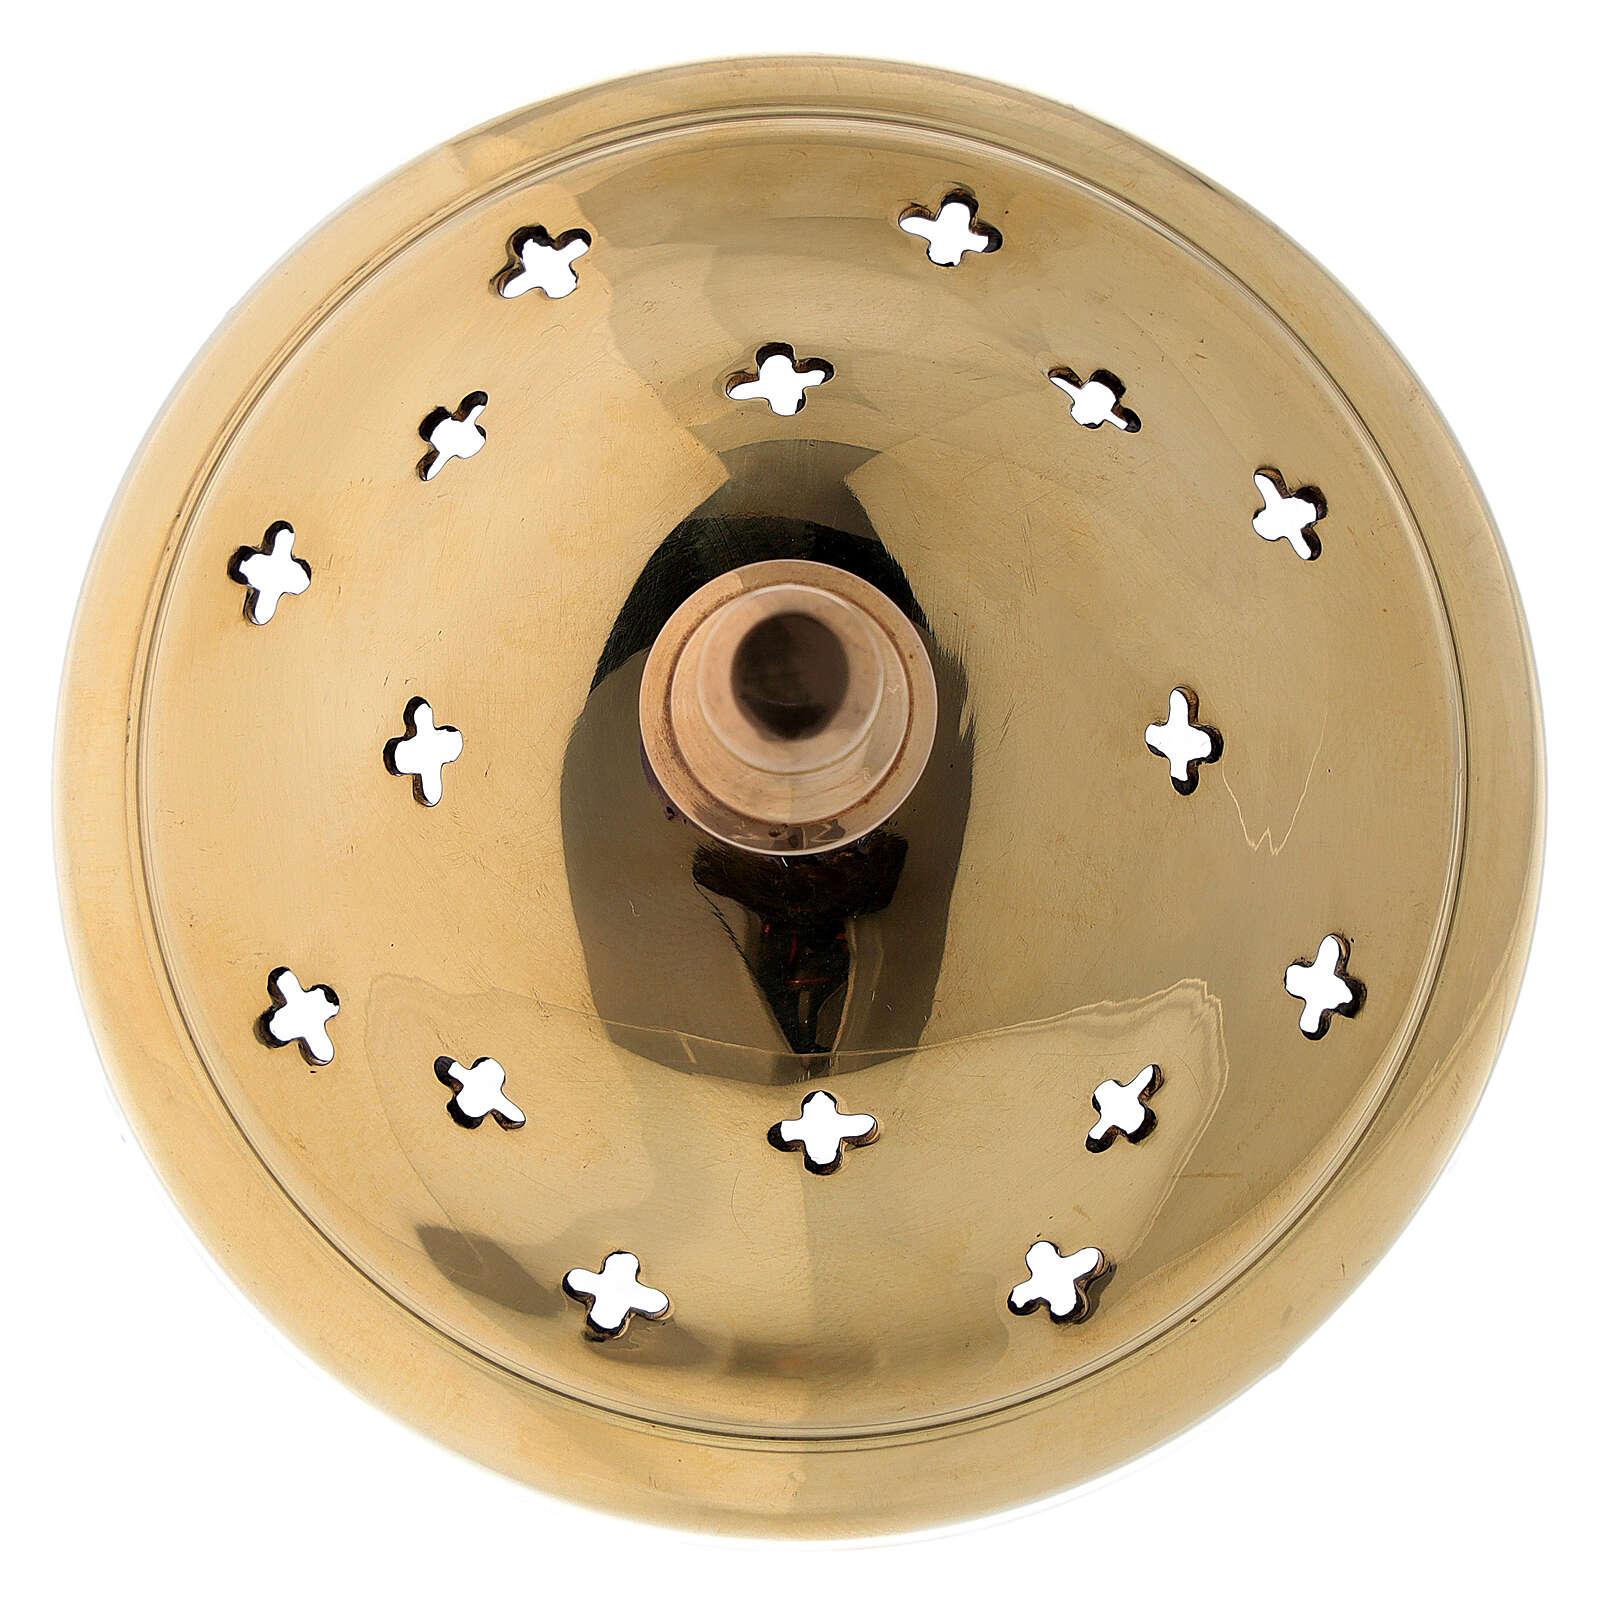 Pebetero latón dorado agujeros en forma de cruz 11 cm 3